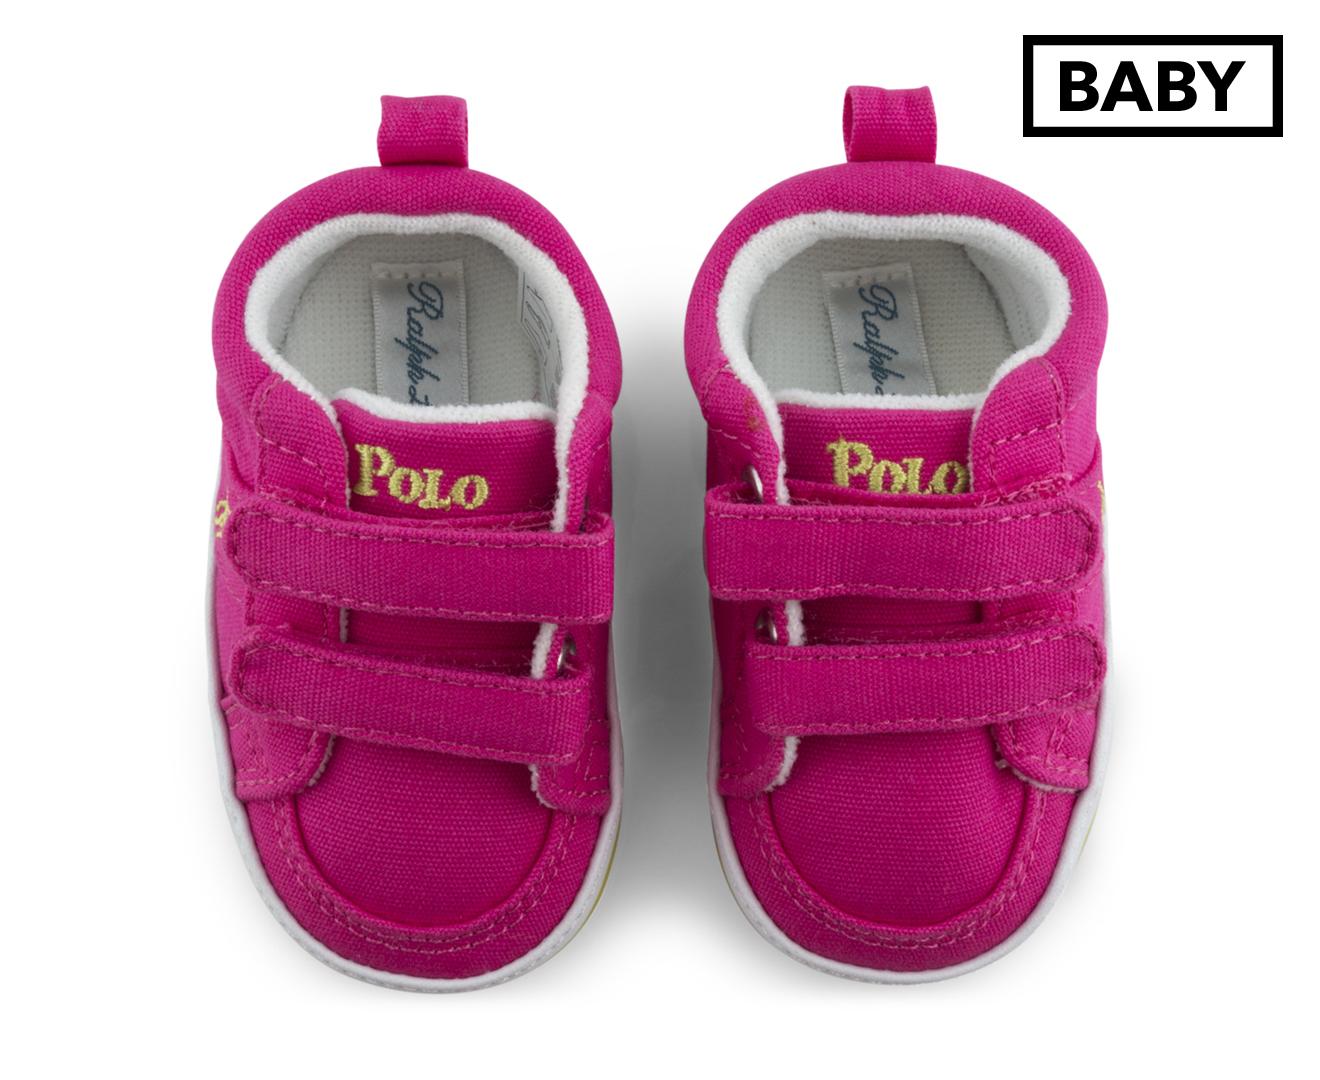 Ralph Lauren Polo Baby Humberto EZ Shoe Bright Pink Lime